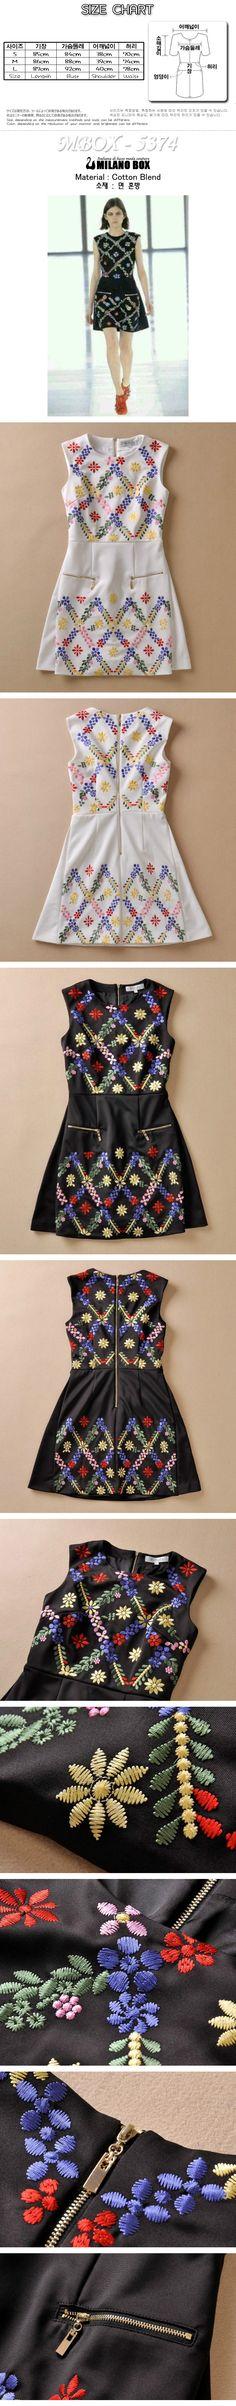 KENZ** STYLE FLOWER EMBROIDERY DRESS MBOX - 5374 - §~MILANO BOX~§ 당신의 패션을 완성 해드립니다. ☆★밀라노박스★☆